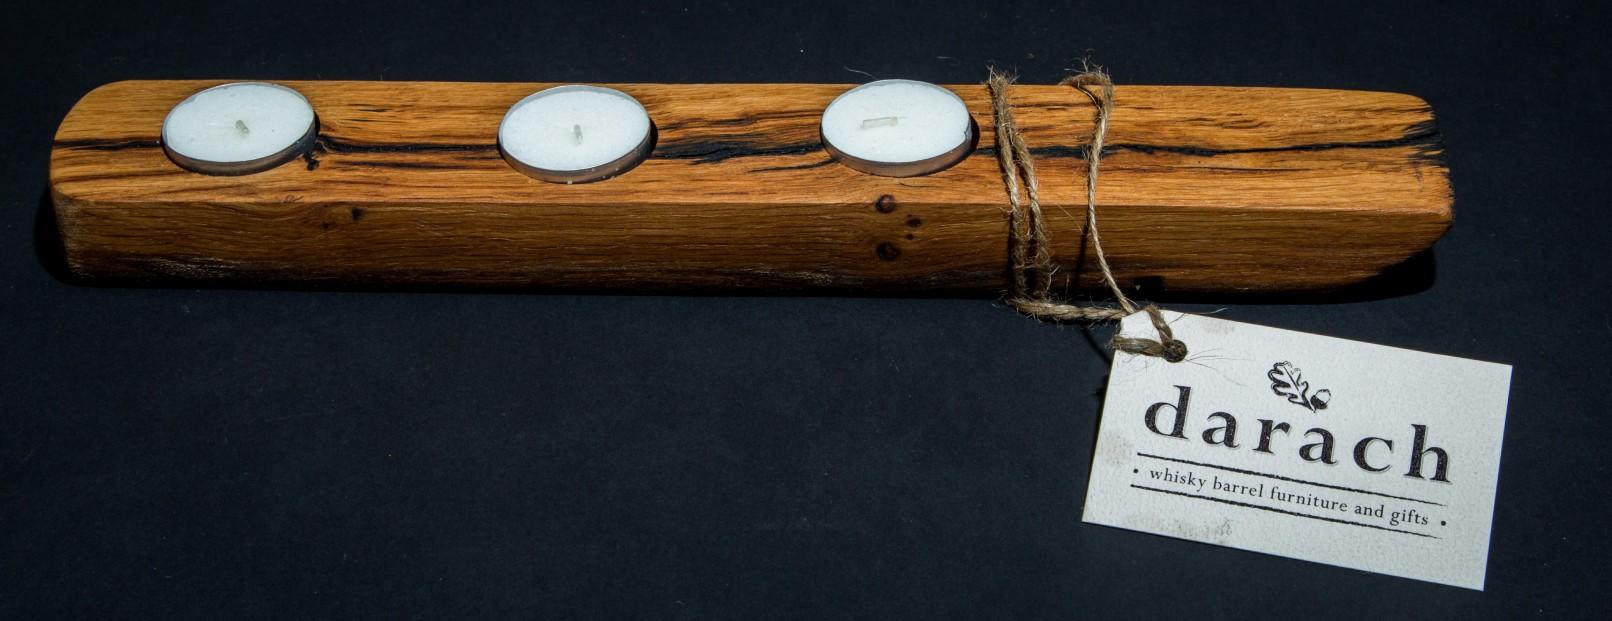 Darach candle holder_3 tealights